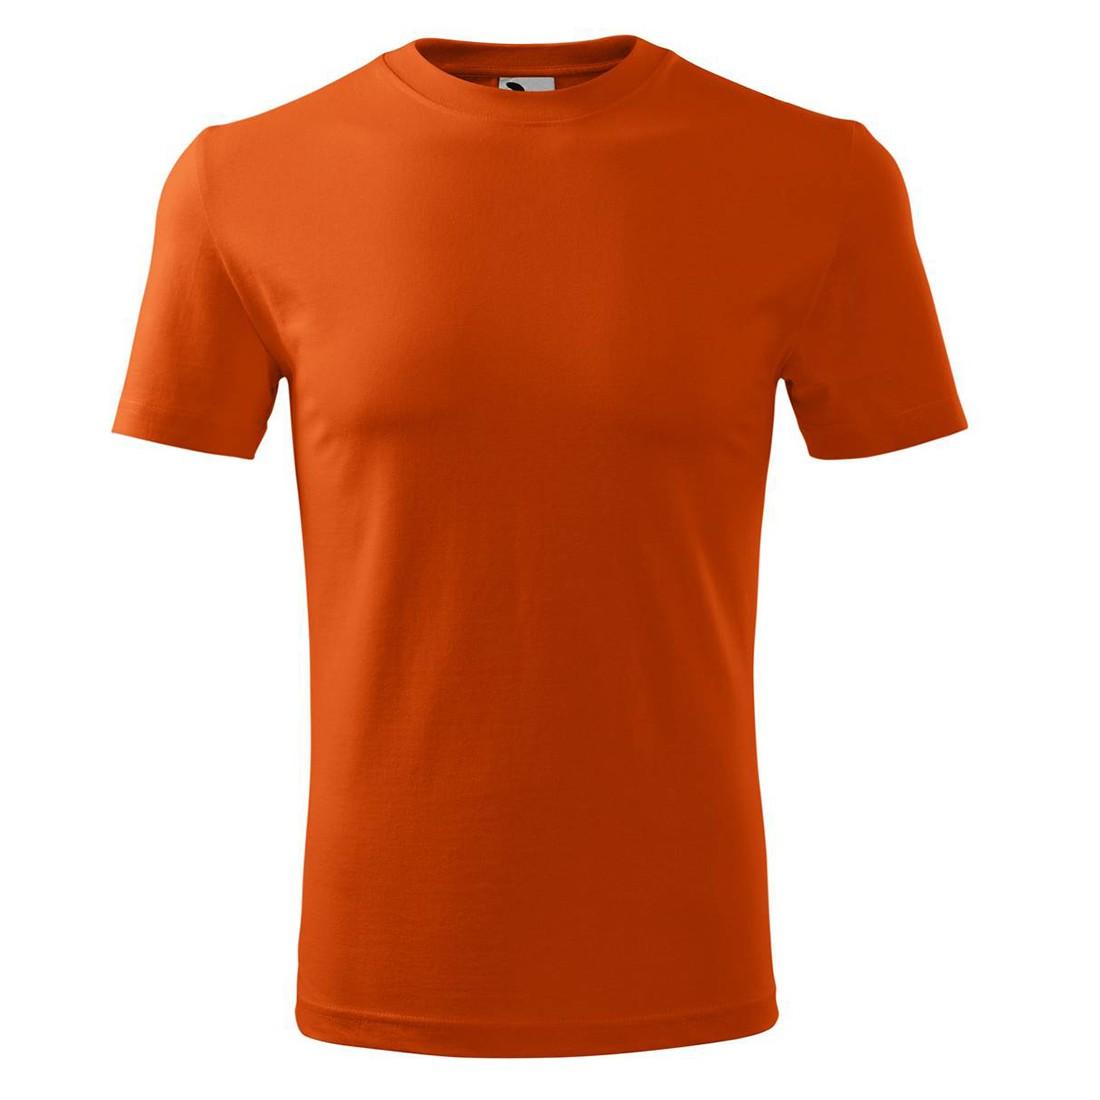 Tricou CLASSIC NEW - Imbracaminte de protectie